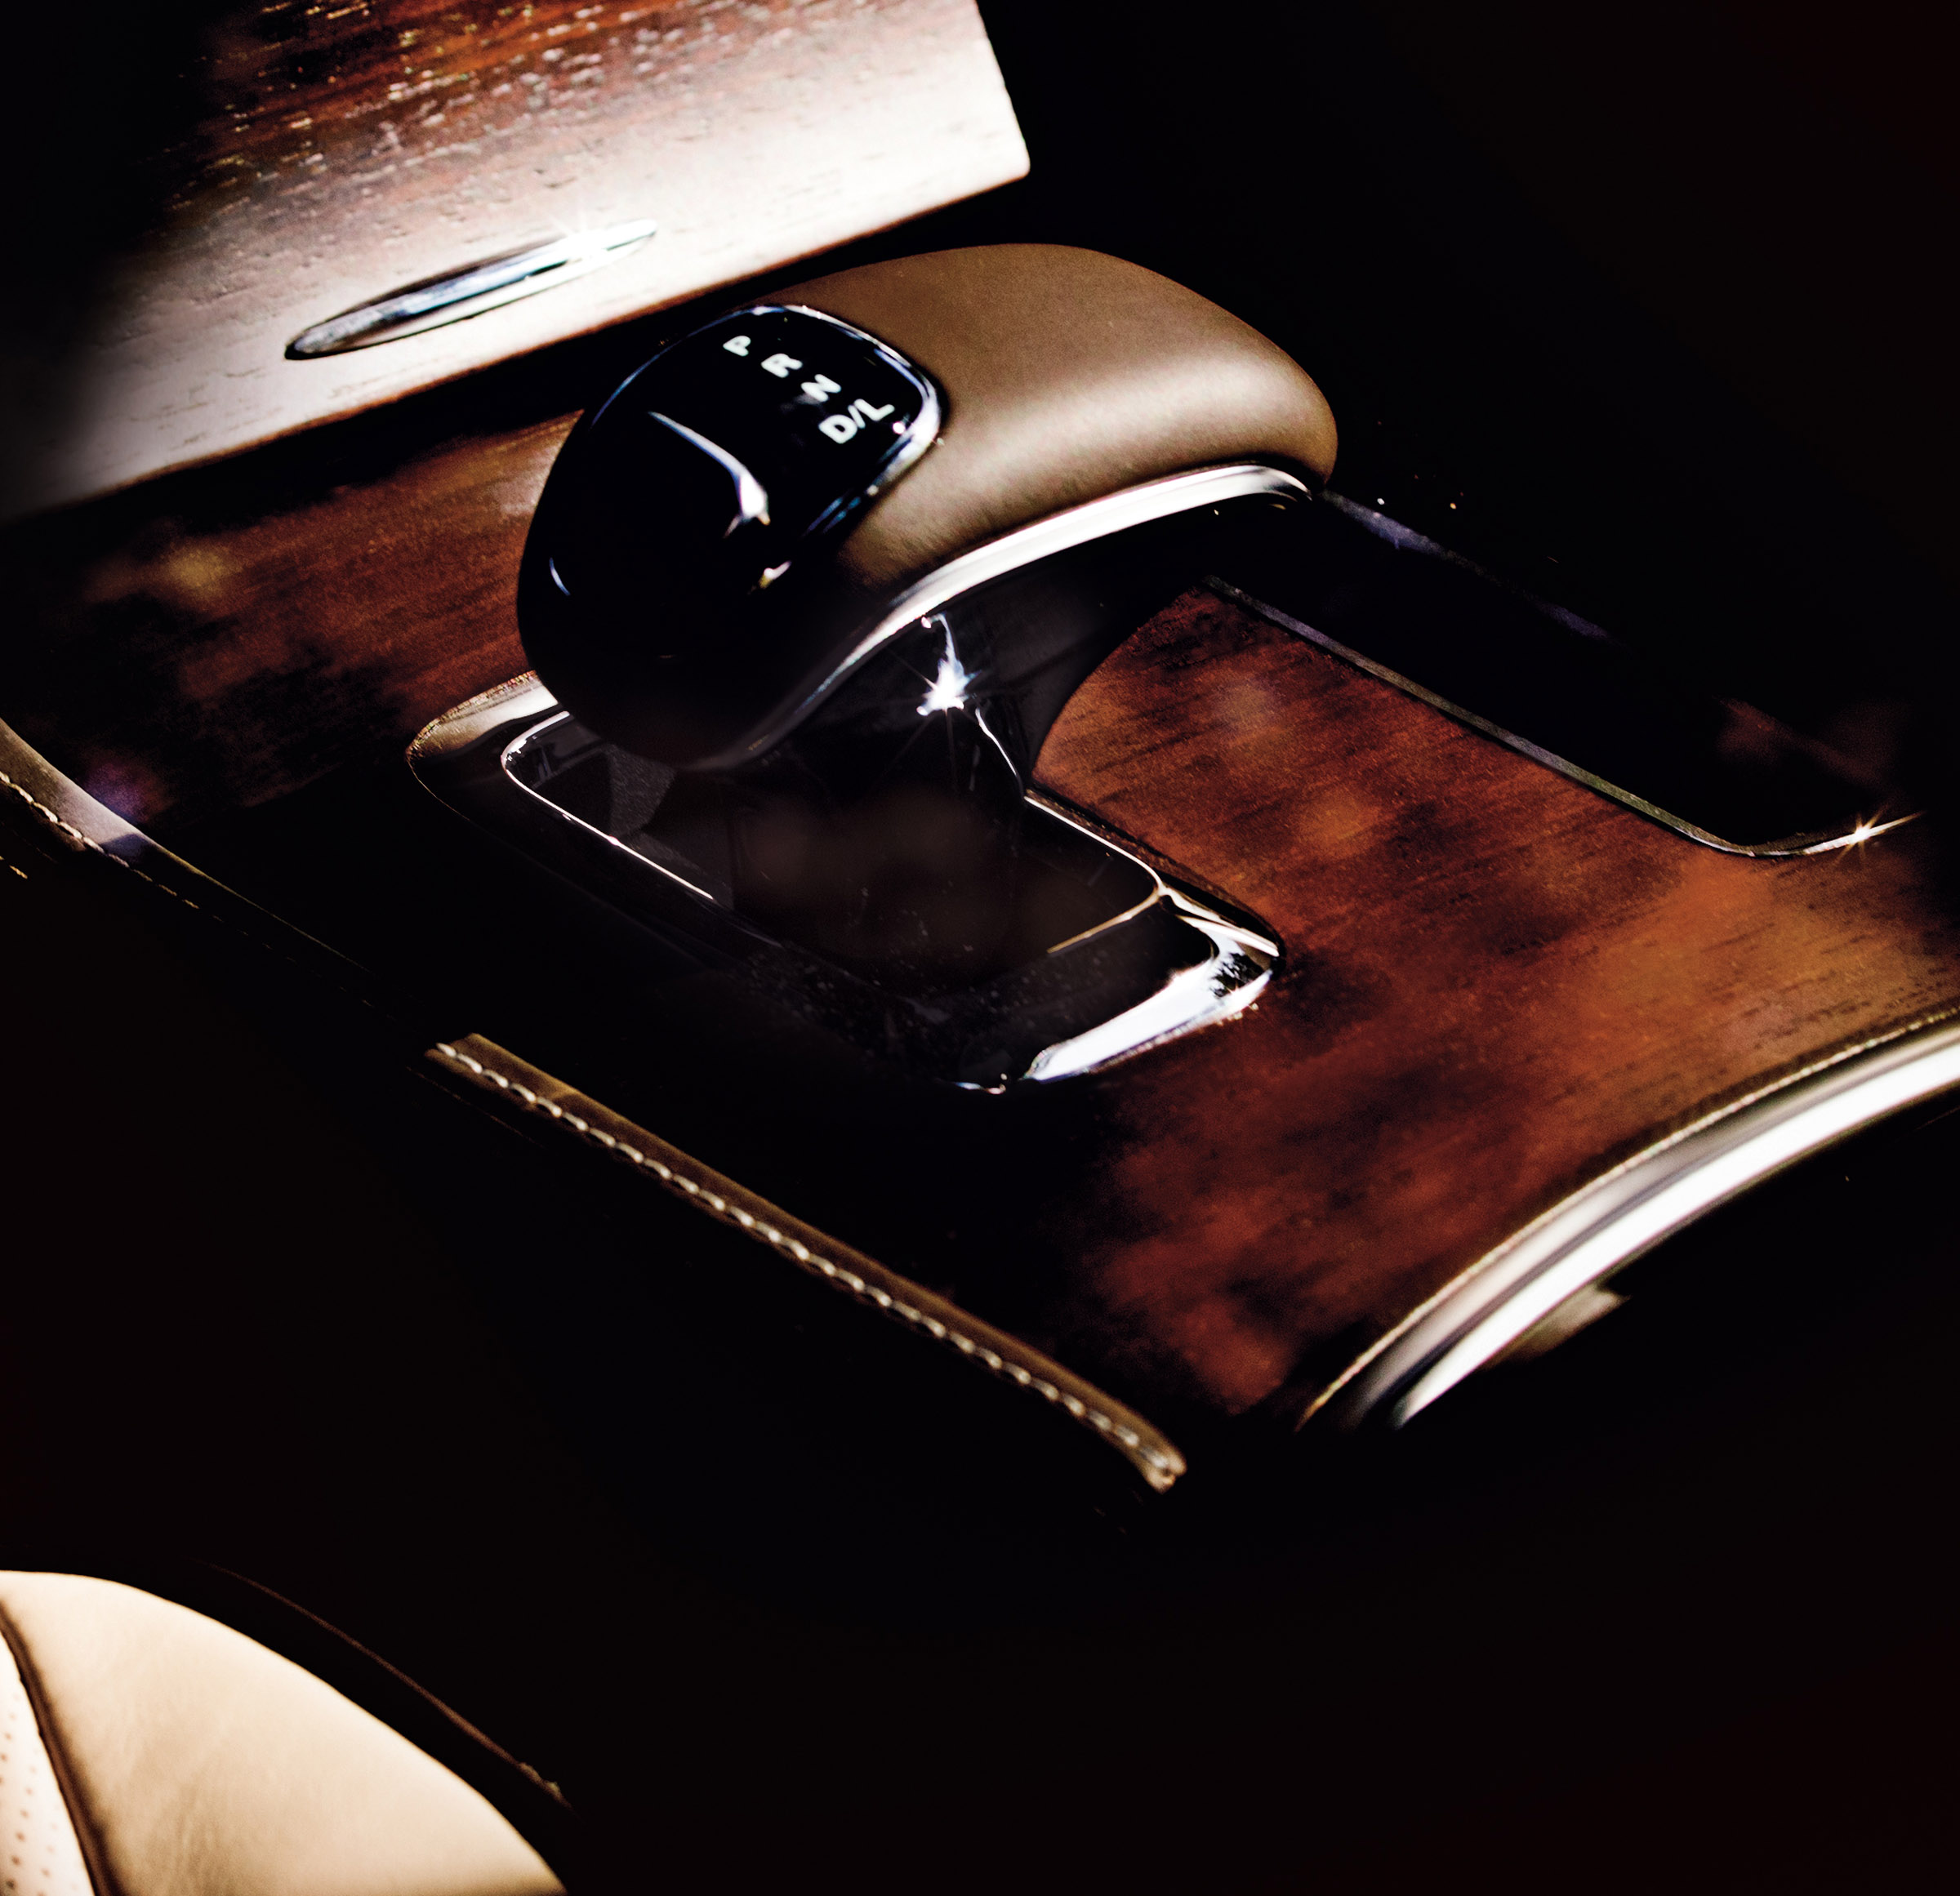 2012 Chrysler 300 Luxury Series 4k Hd Wallpaper: BMW 4-Series Gran Coupe Individual Frozen Cashmere Silver